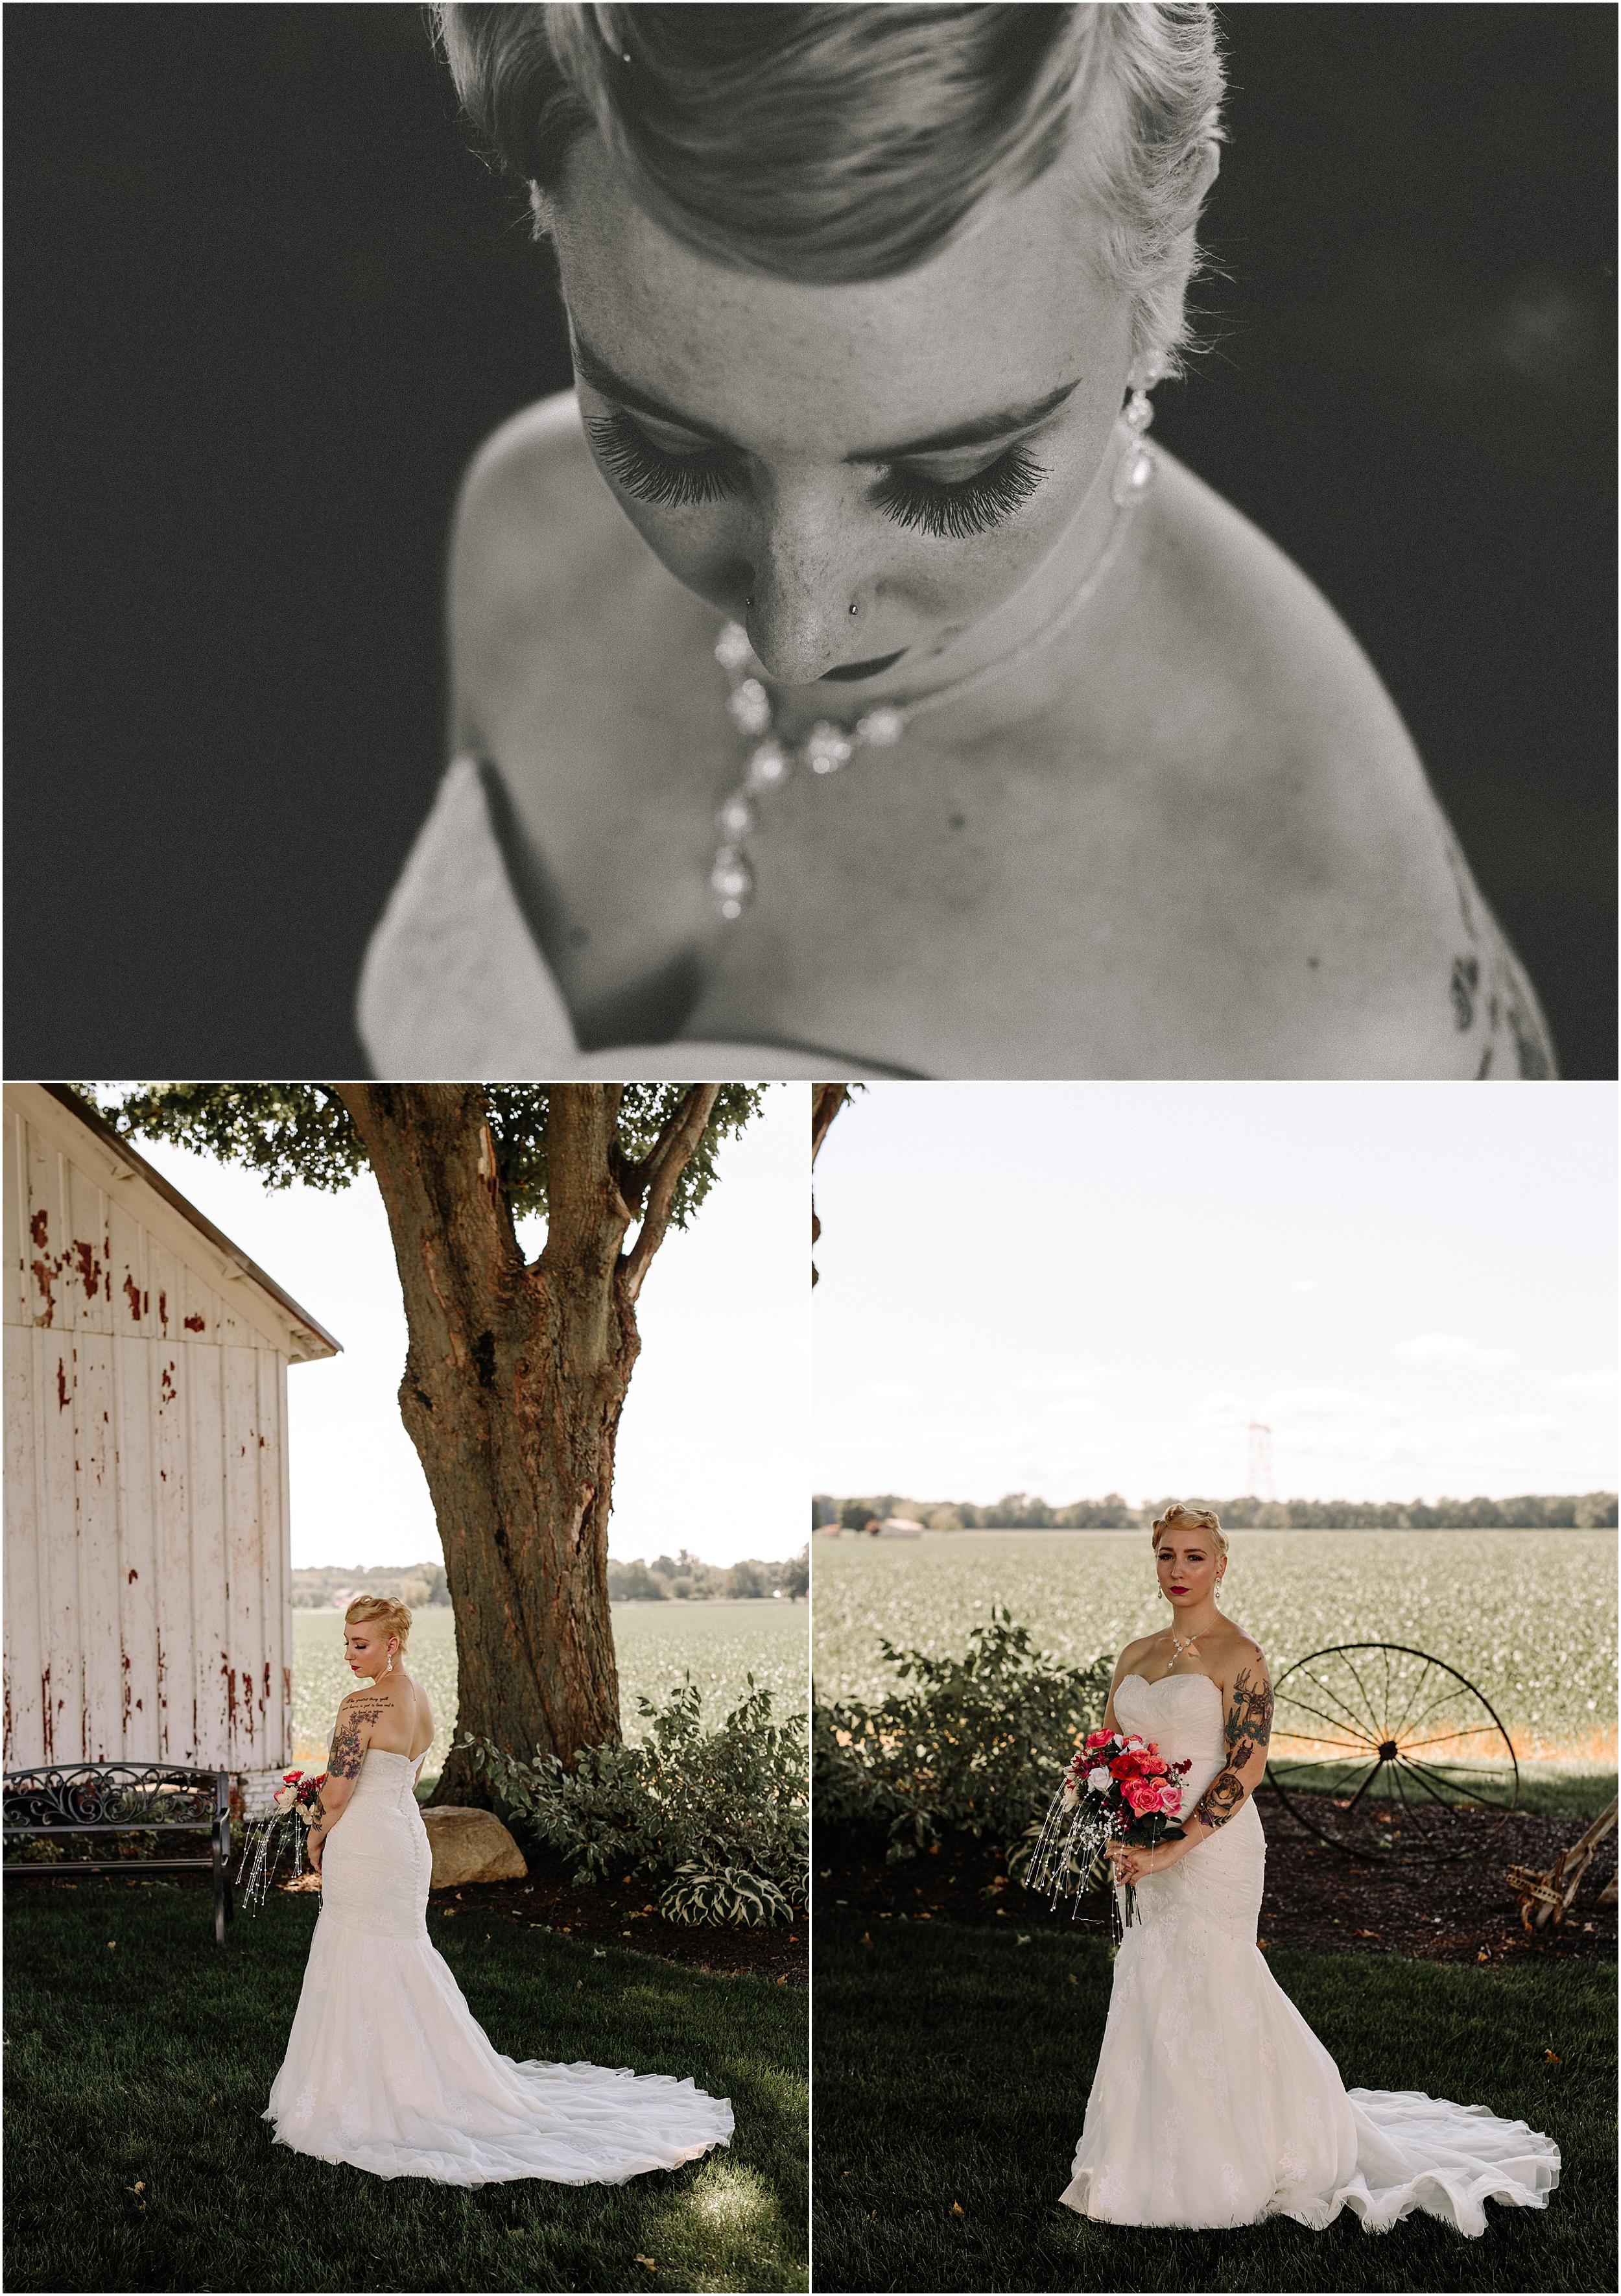 erika.mattingly.photography-71.jpg